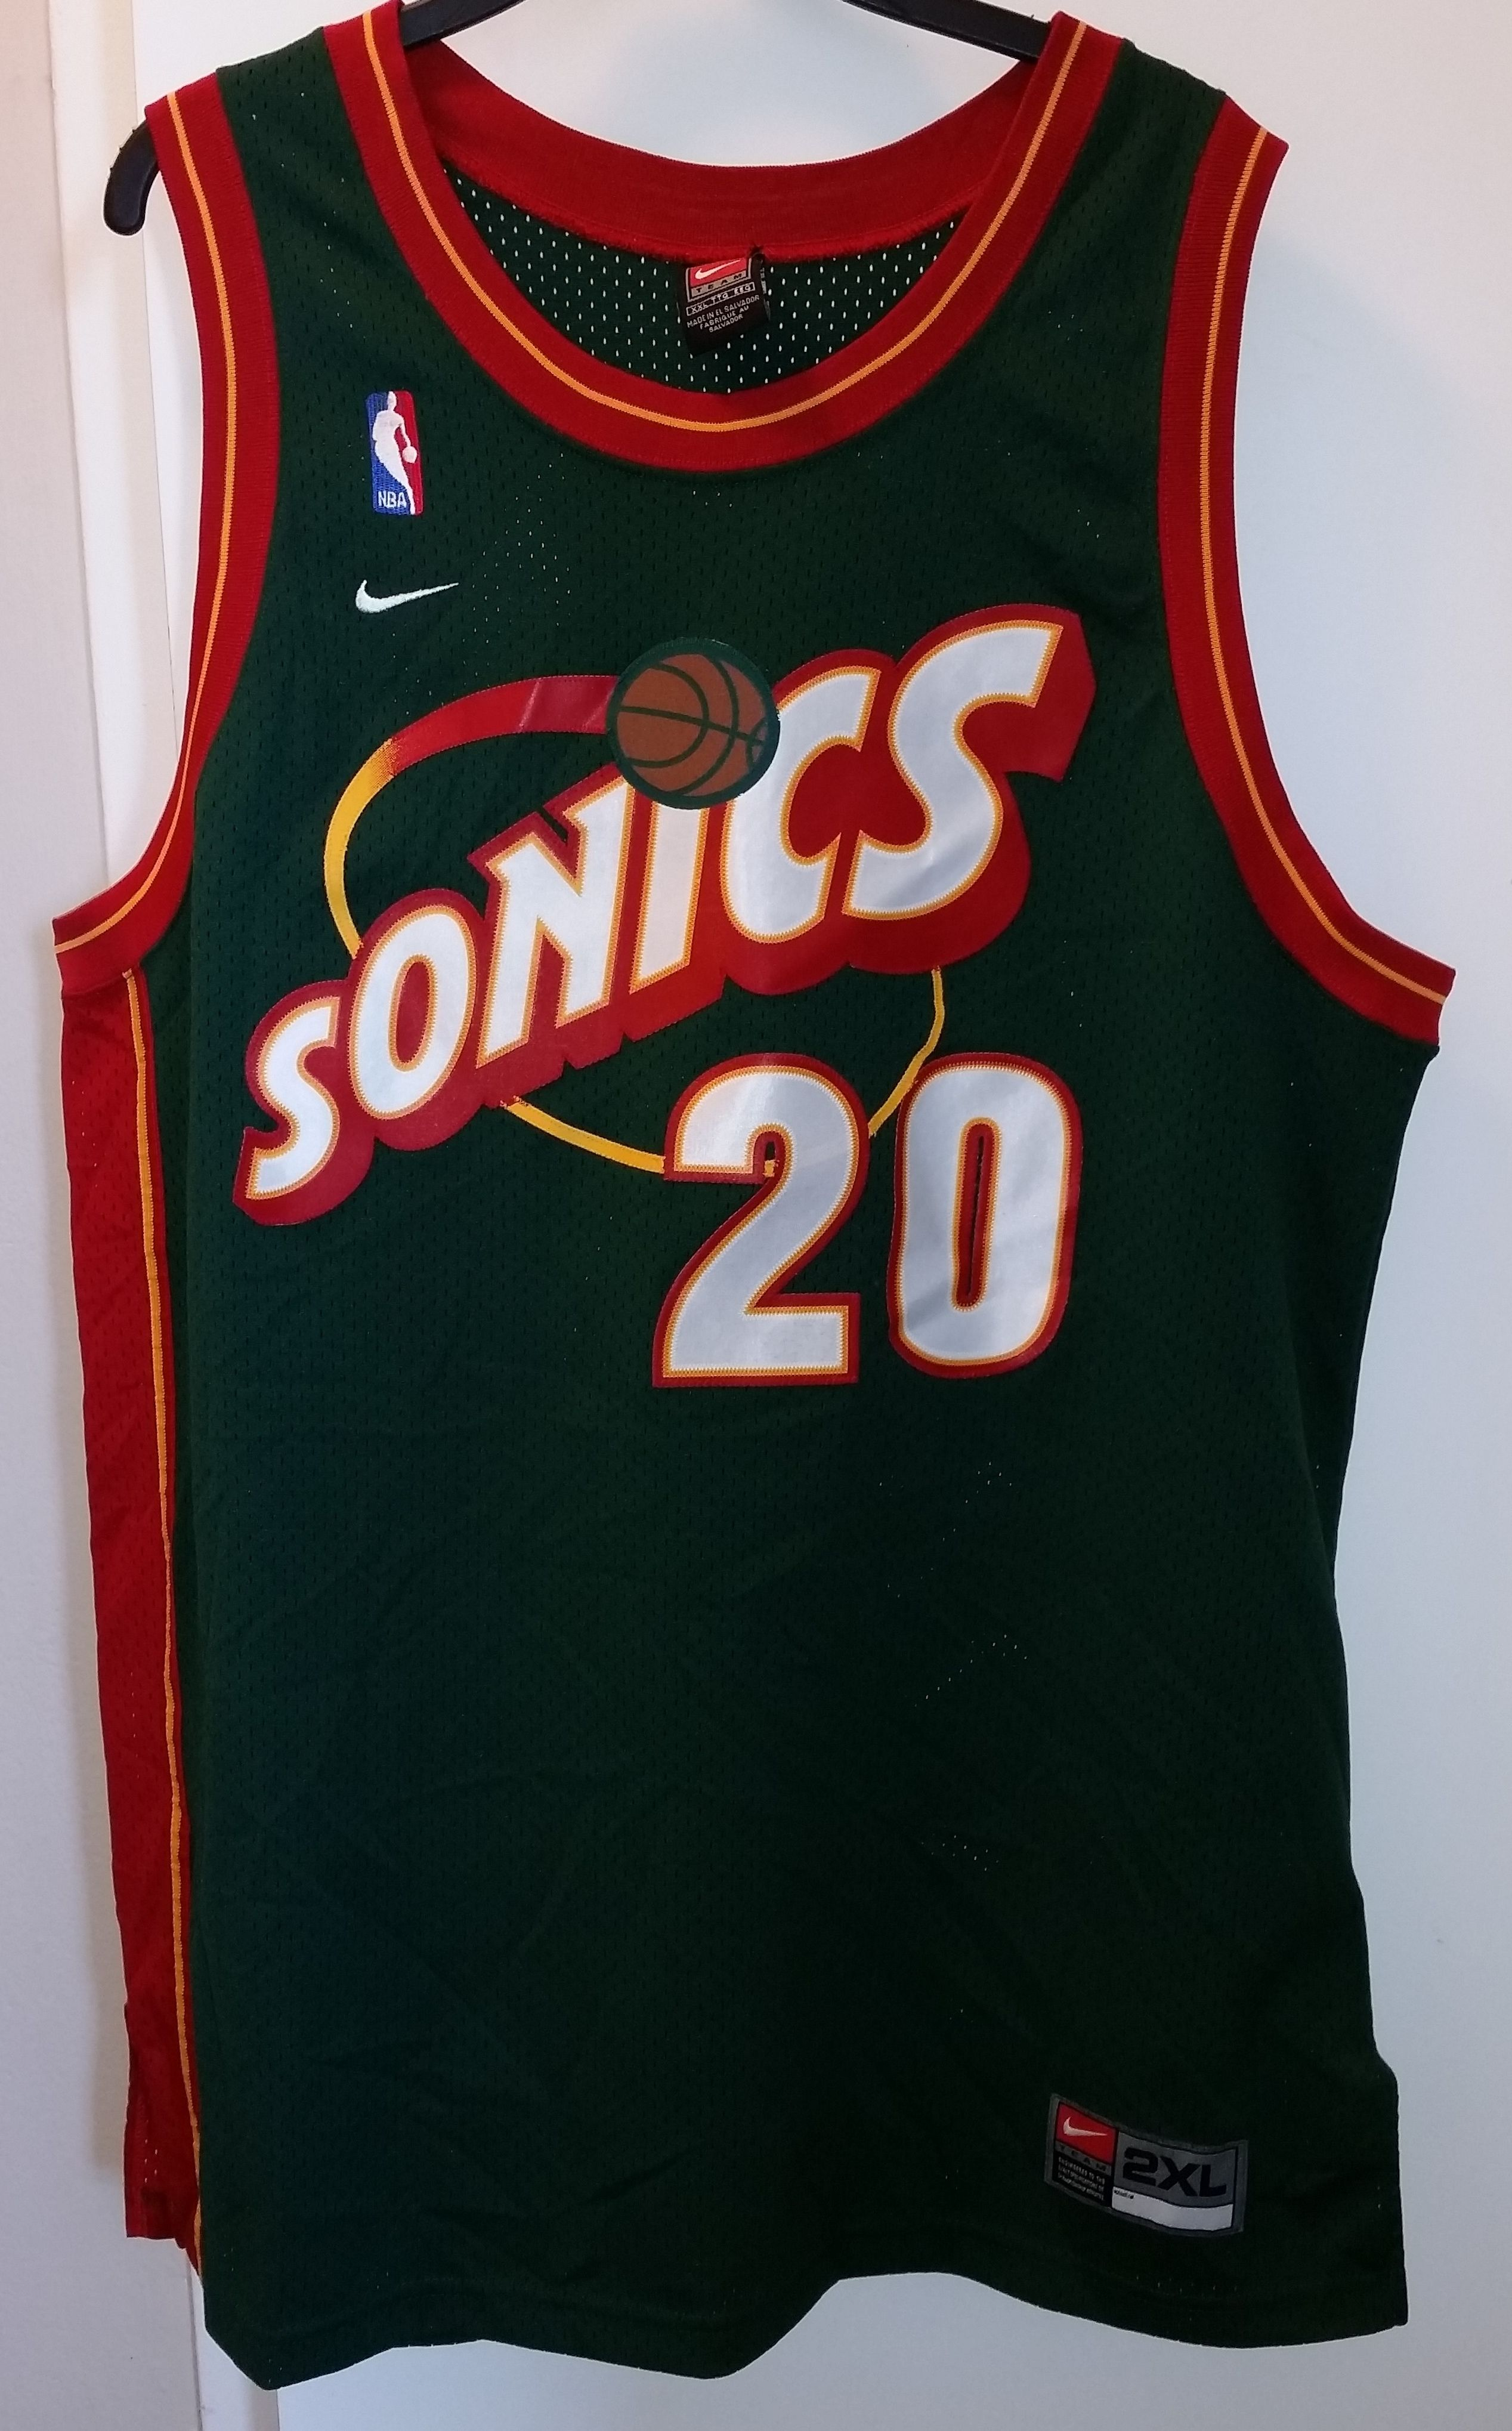 00c644c493db Vintage 90s Nike NBA Seattle Supersonics Gary Payton Jersey